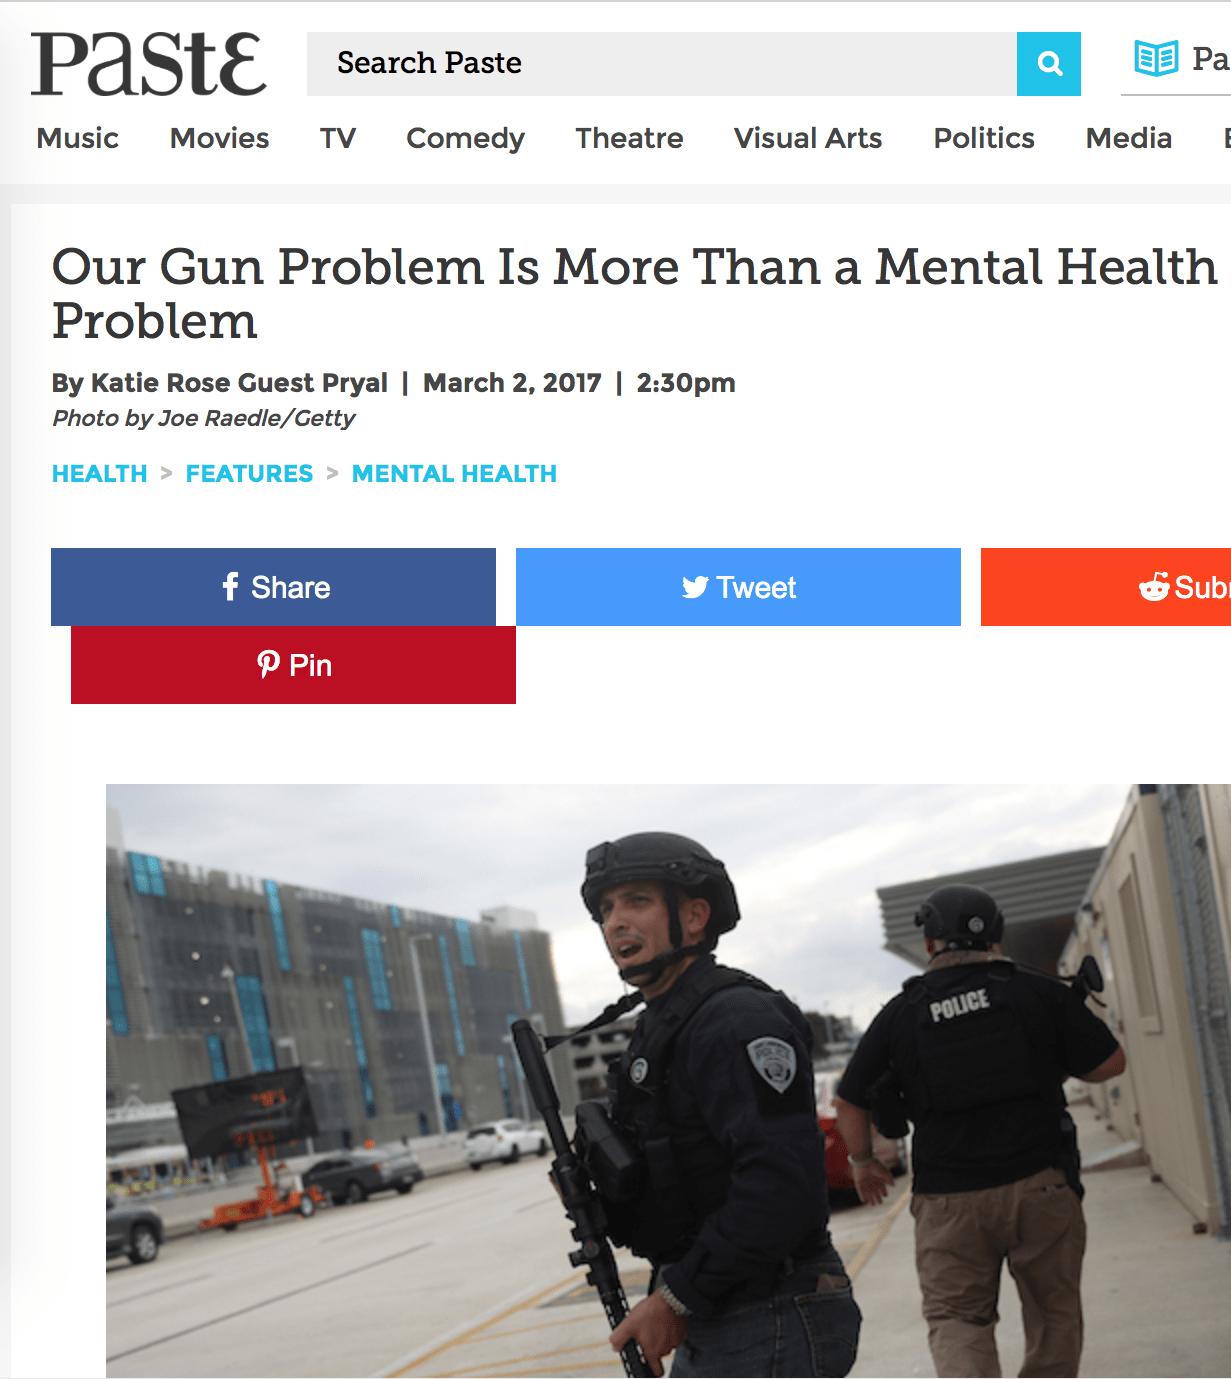 Paste Magazine: Our Gun Problem Is More Than a Mental Health Problem